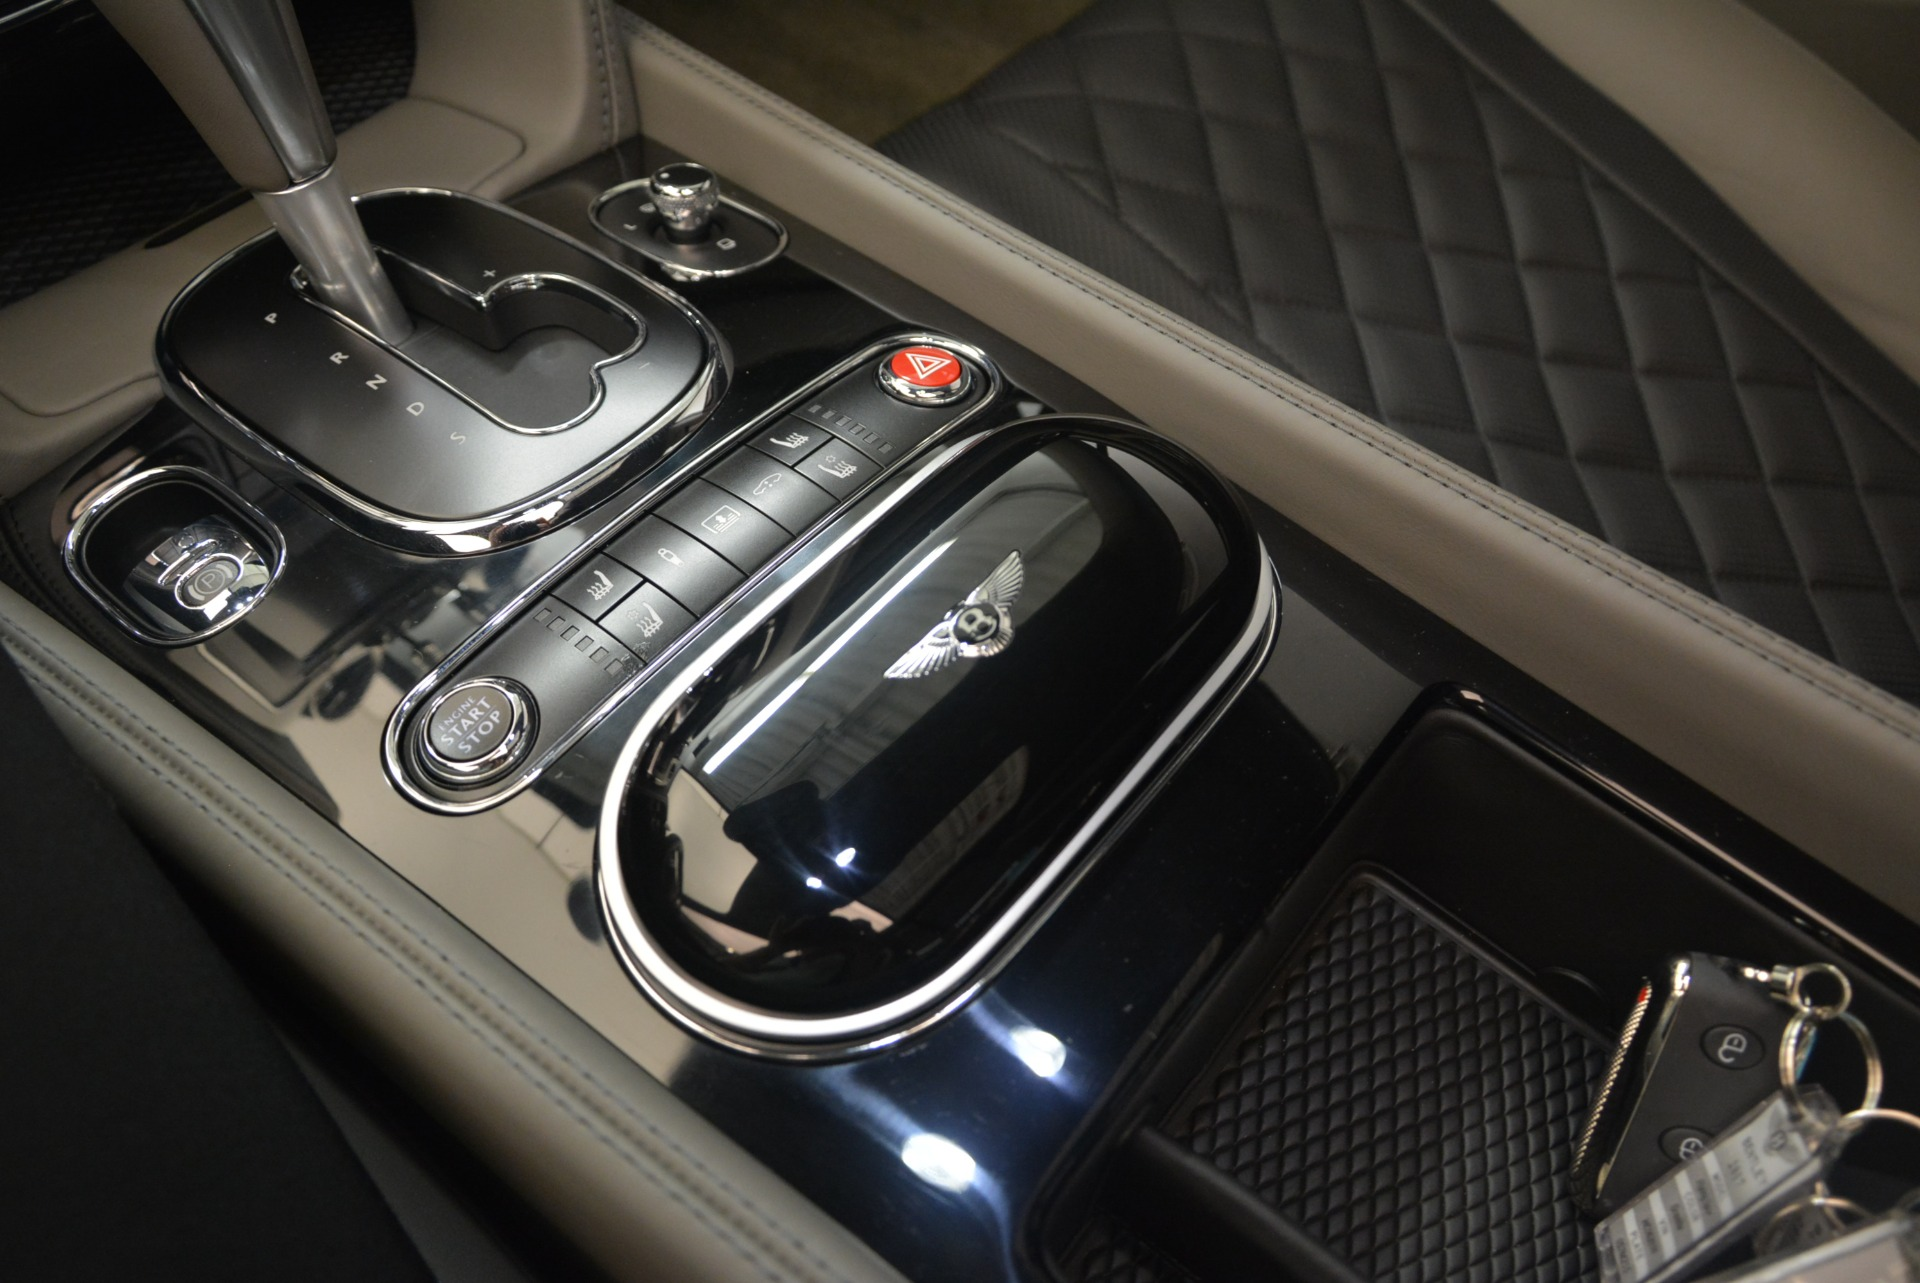 Used 2017 Bentley Flying Spur V8 S For Sale In Westport, CT 2263_p23